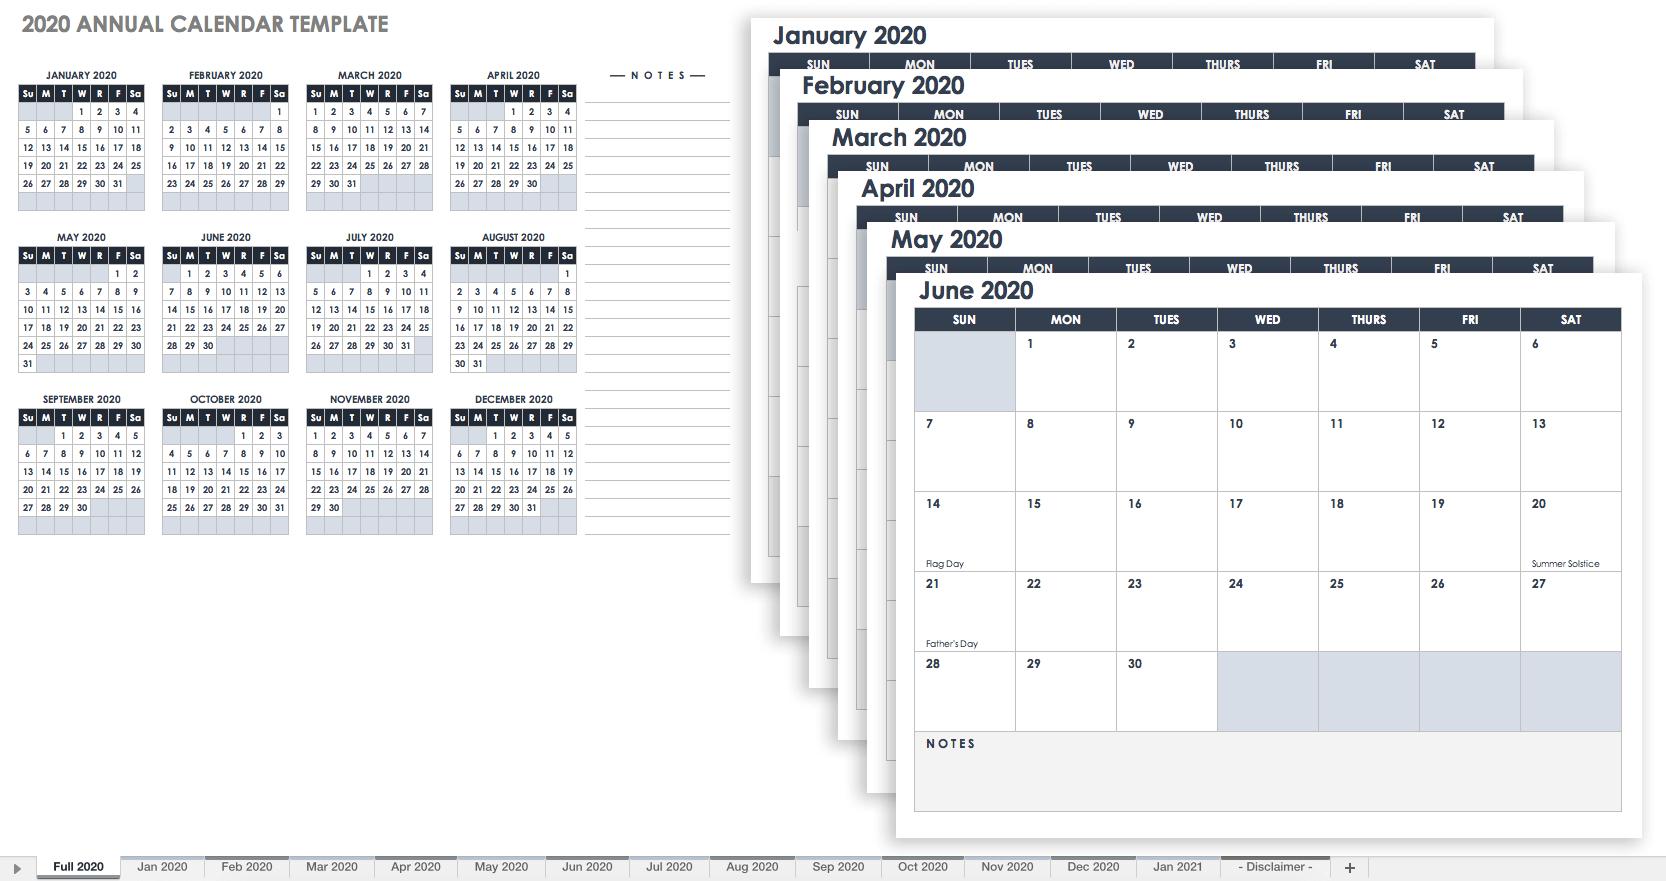 Free, Printable Excel Calendar Templates For 2019 & On | Smartsheet Calendar 2019 In Excel